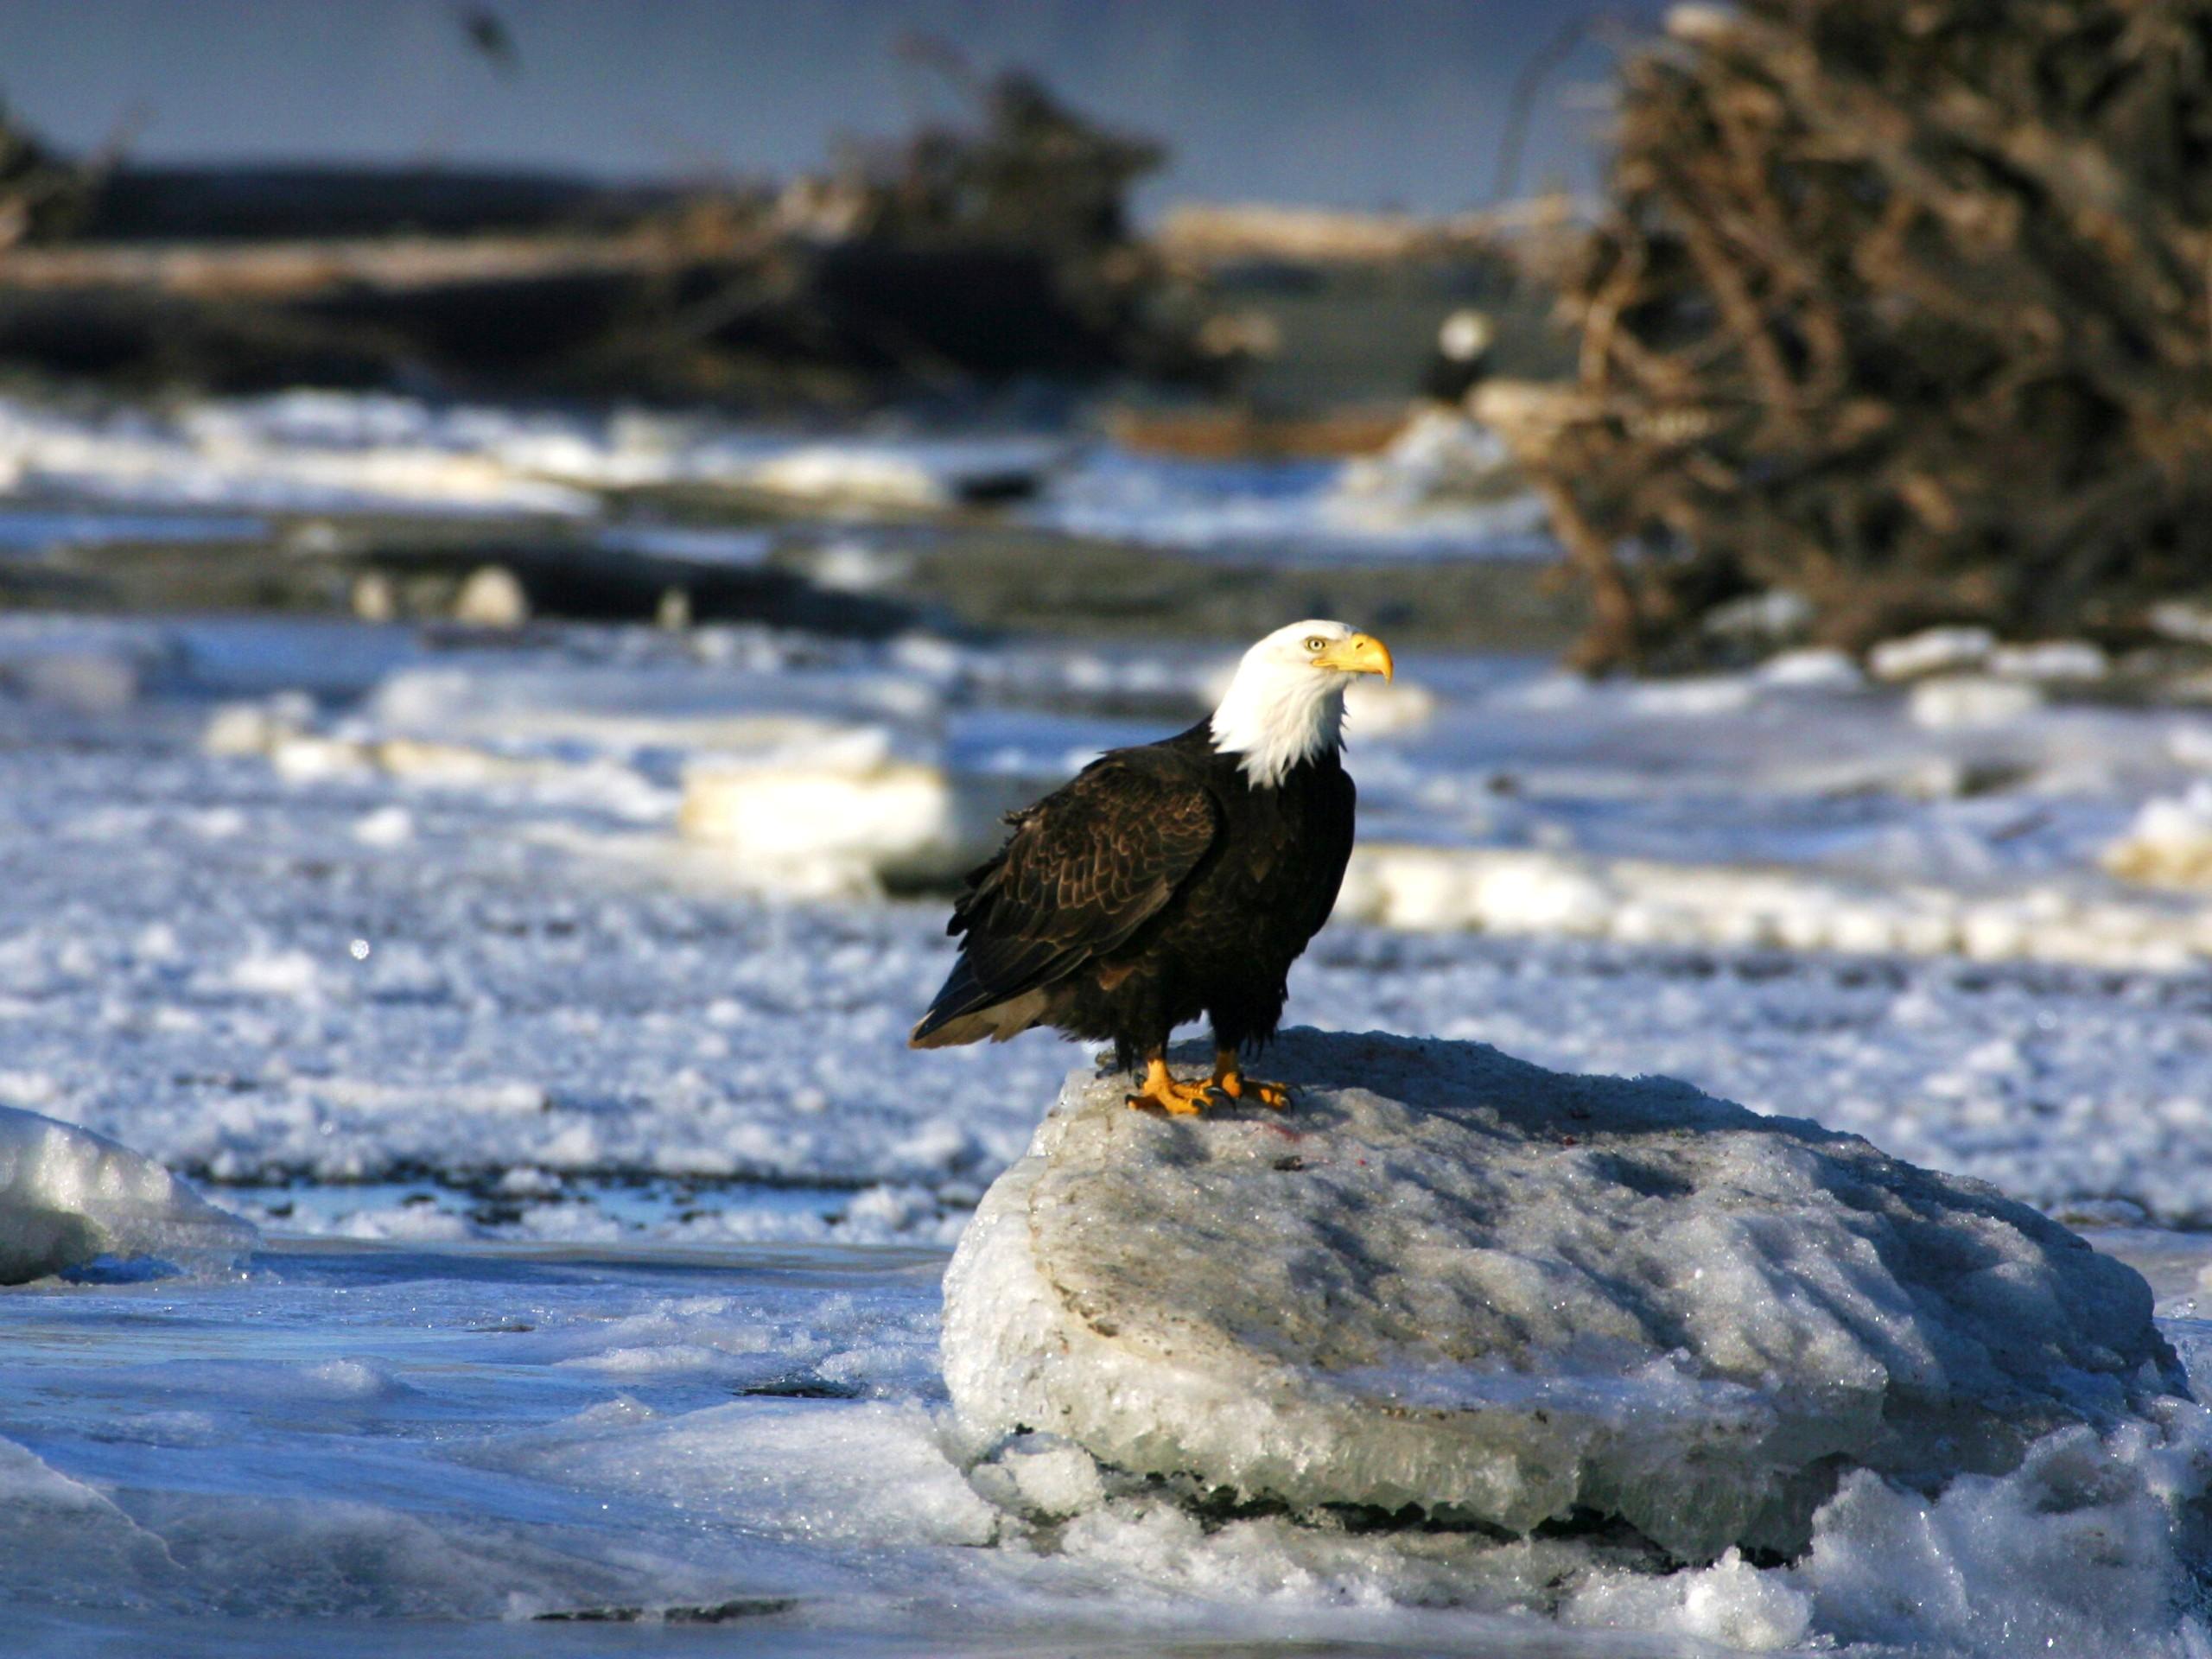 Bald eagle in Yukon